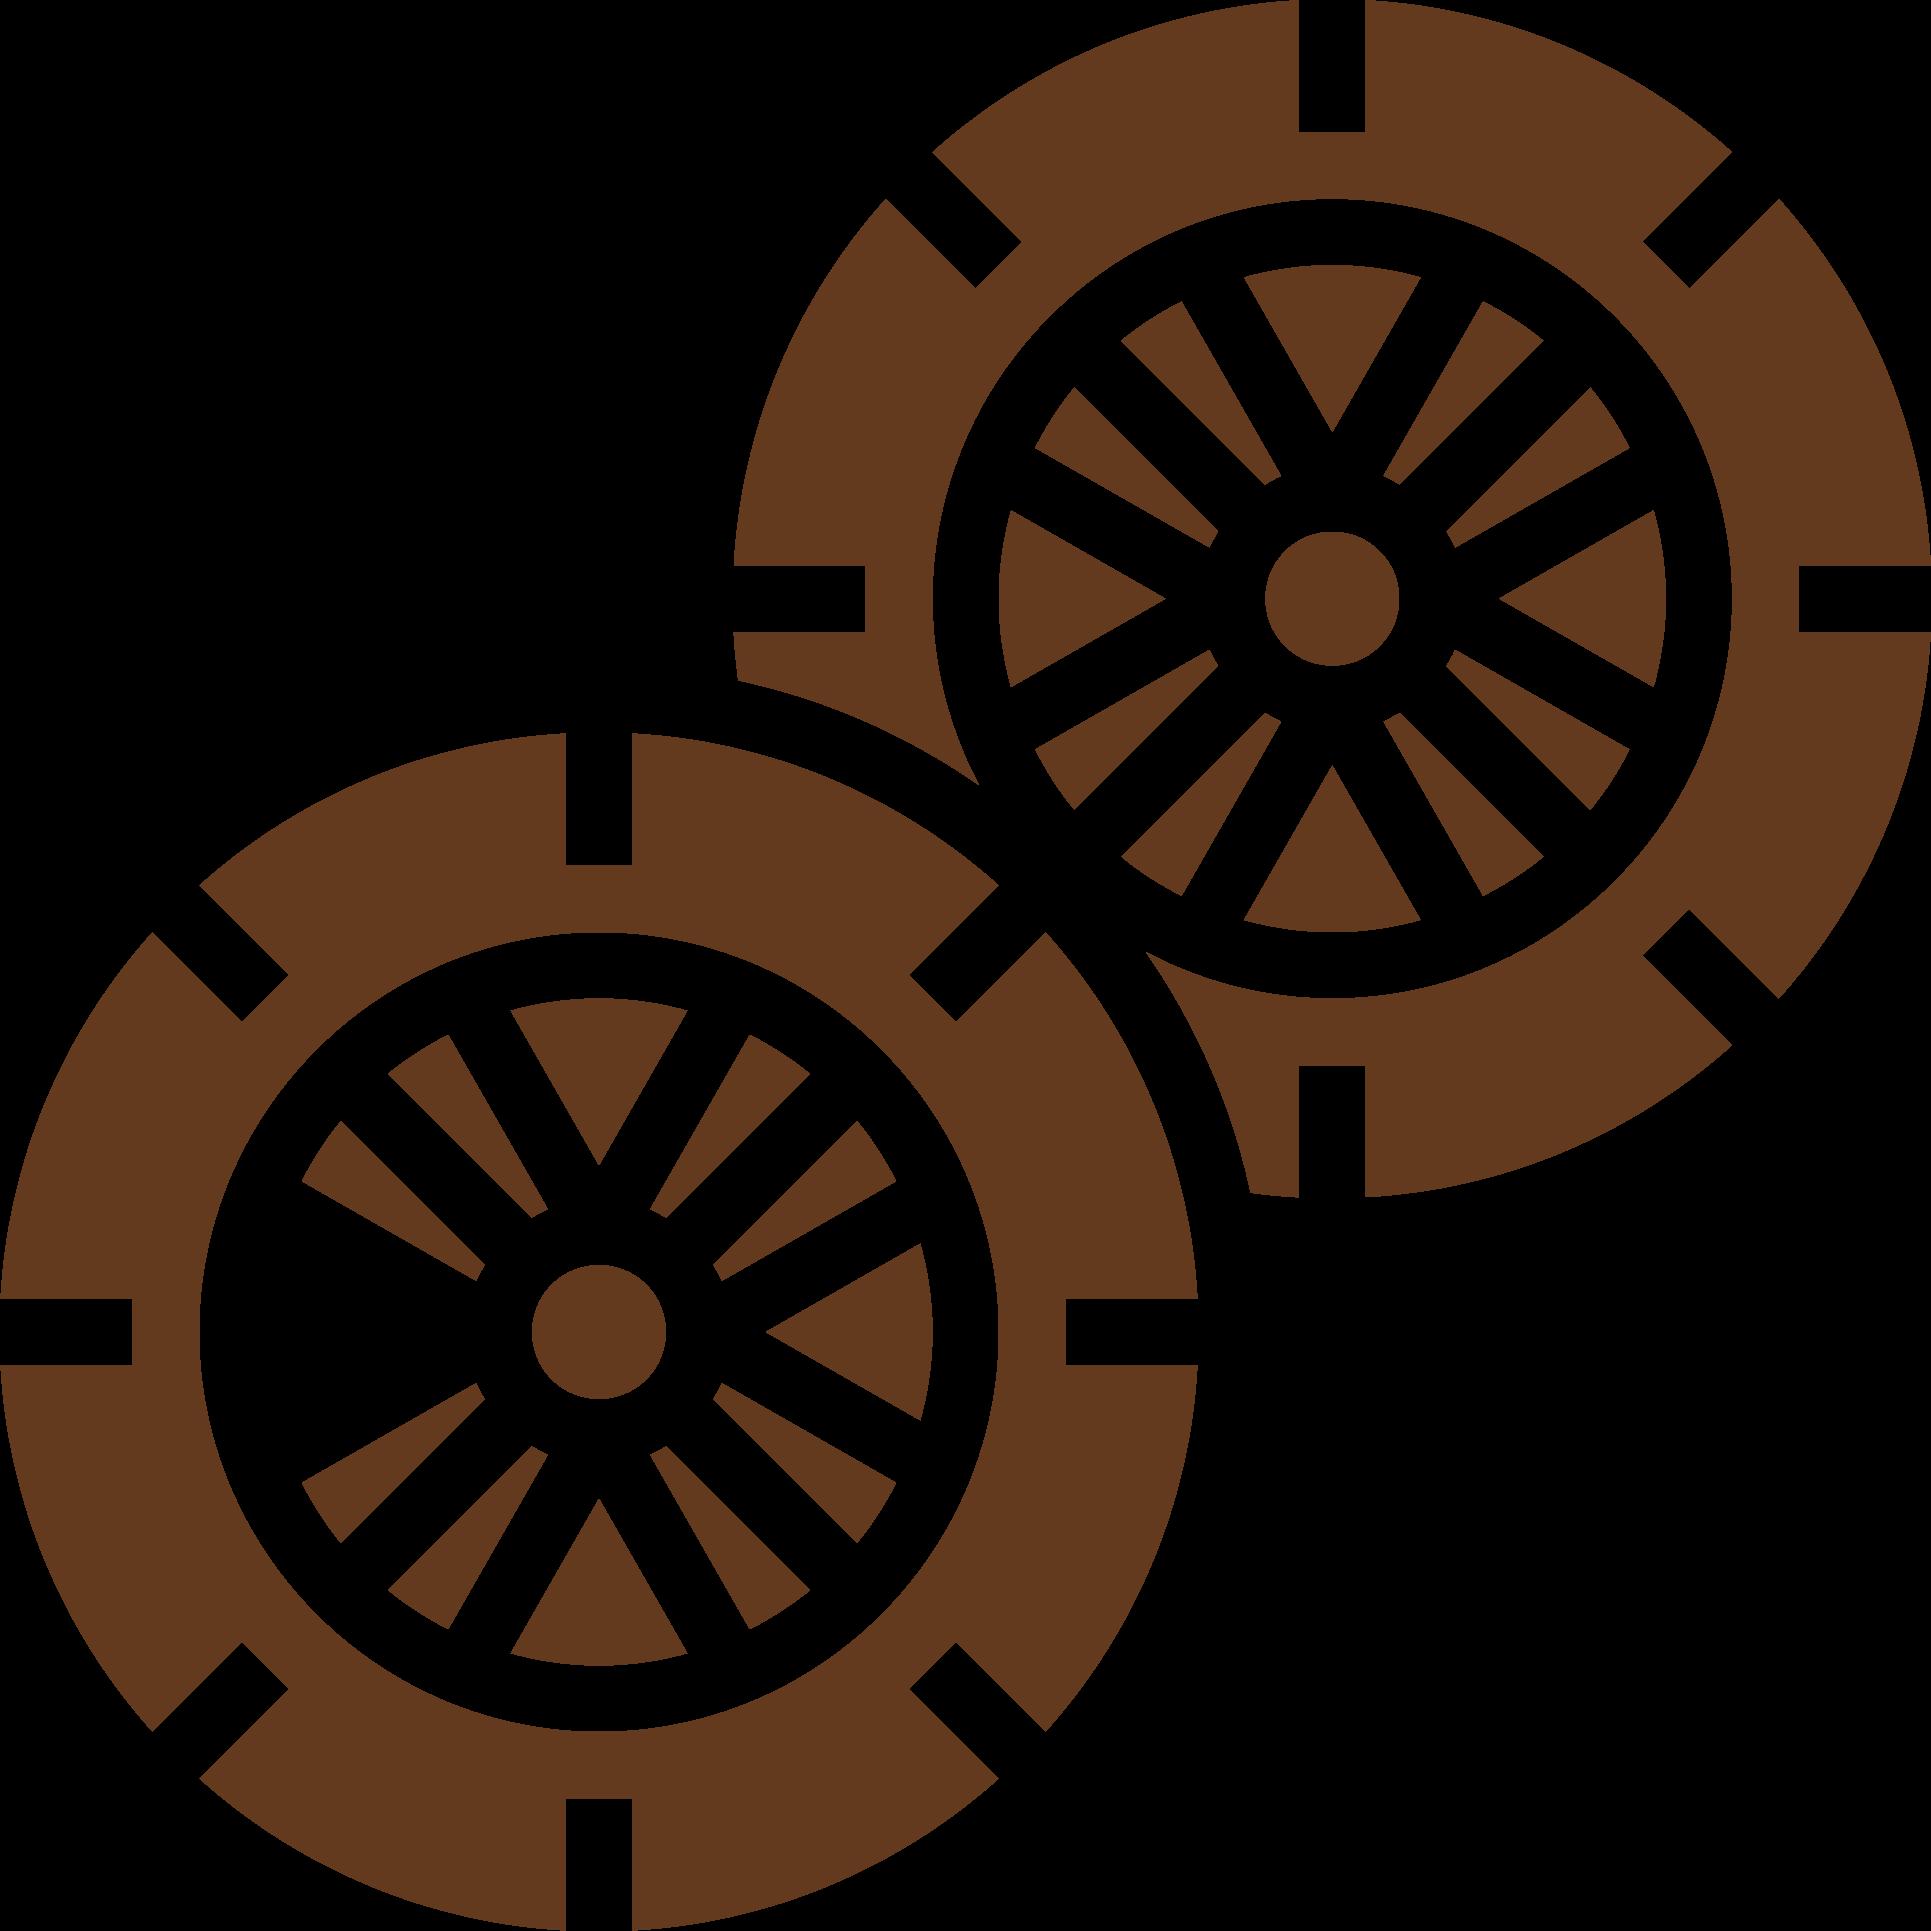 icone caoutchou